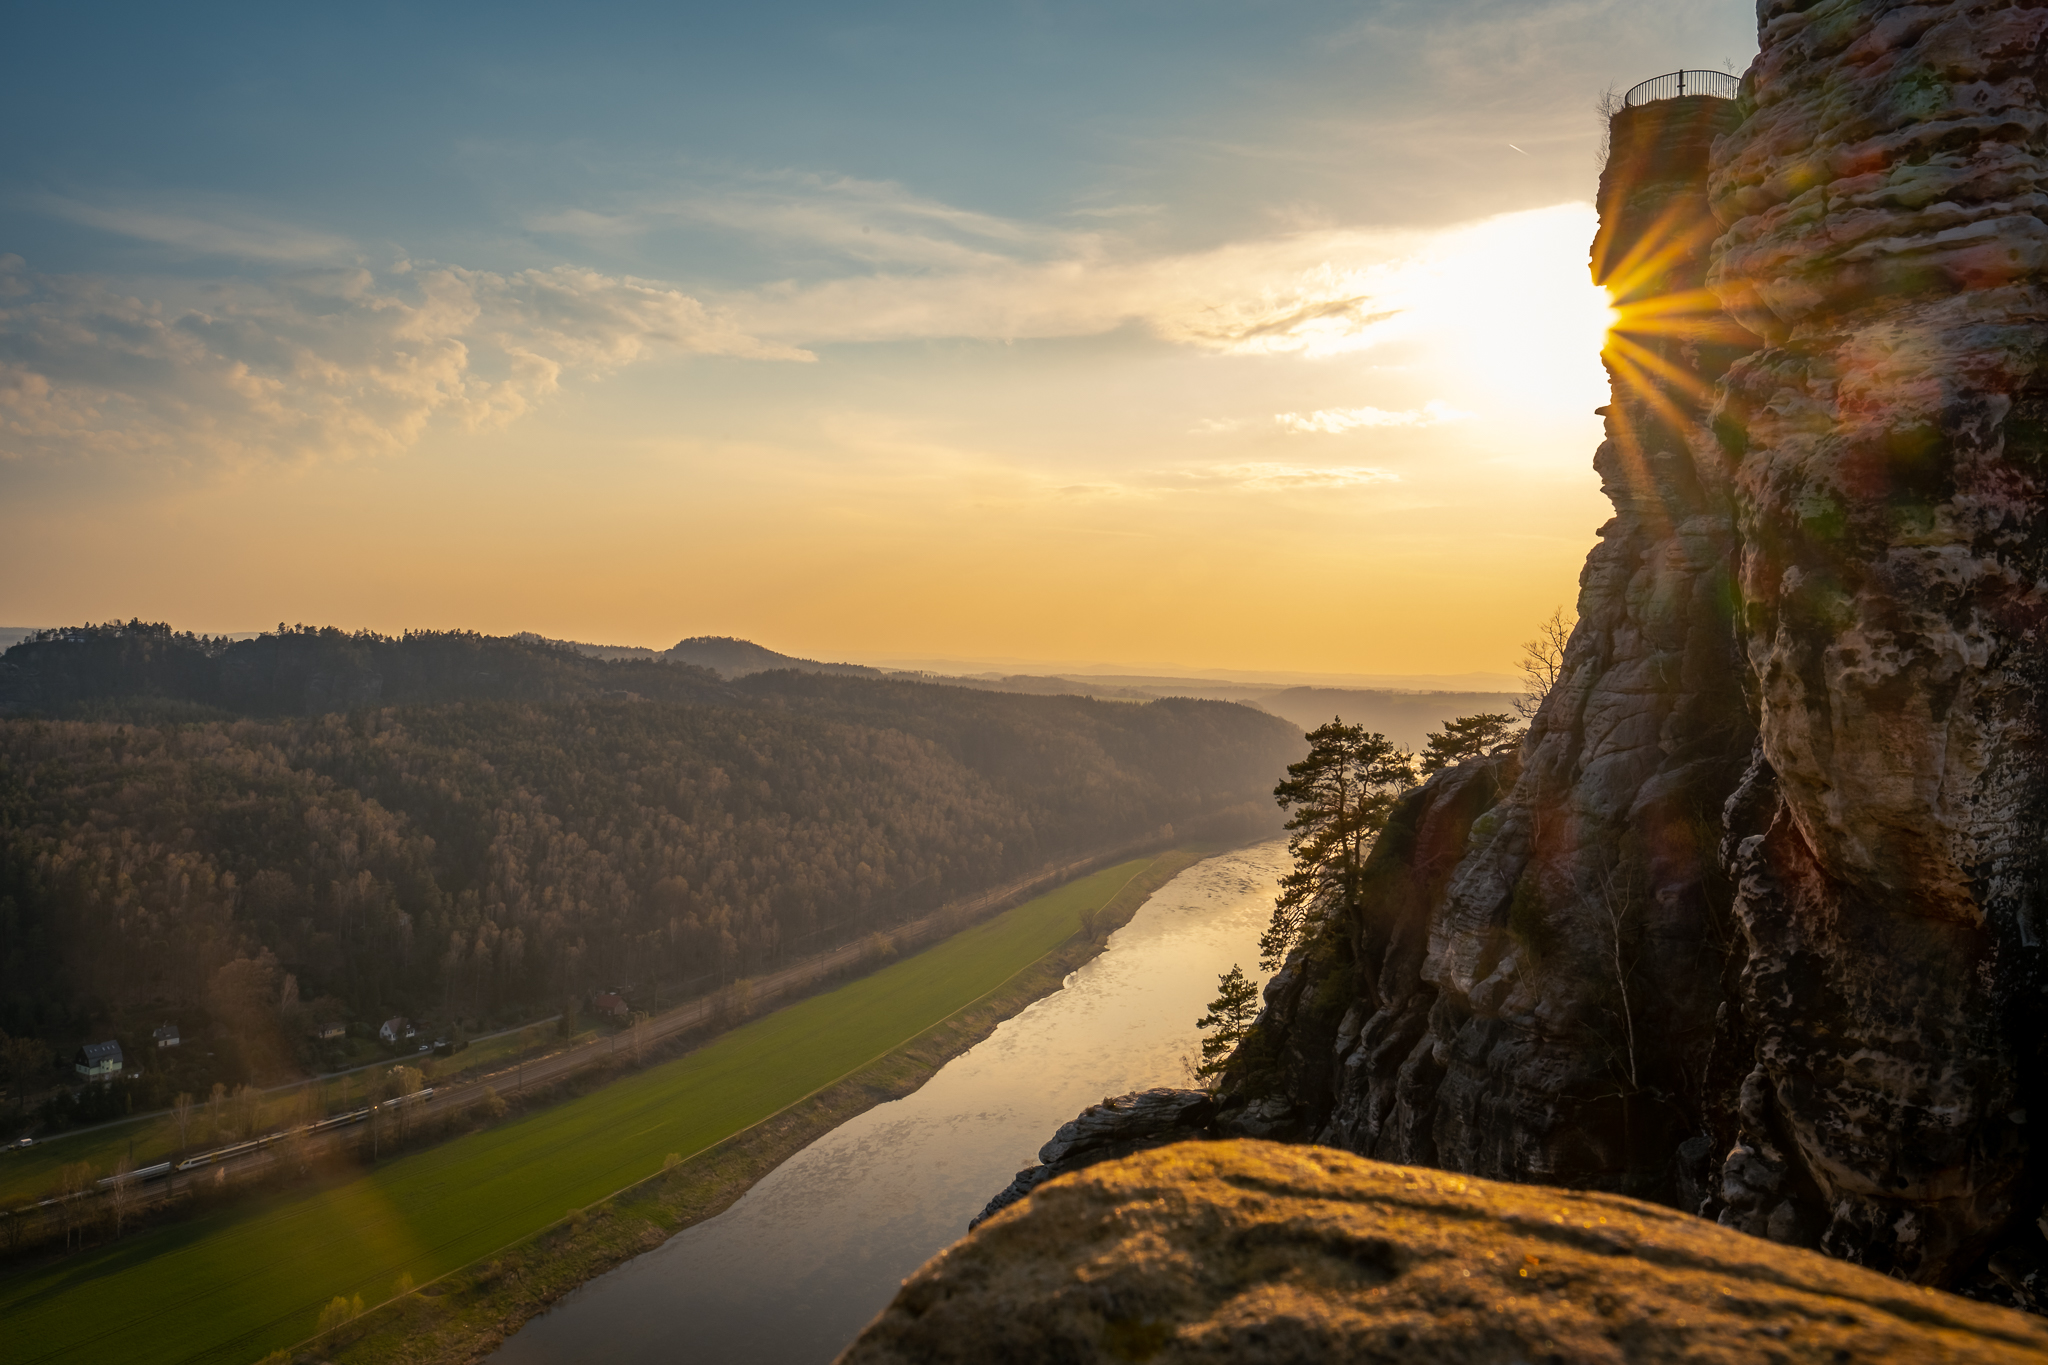 Sonnenuntergang - Bastei